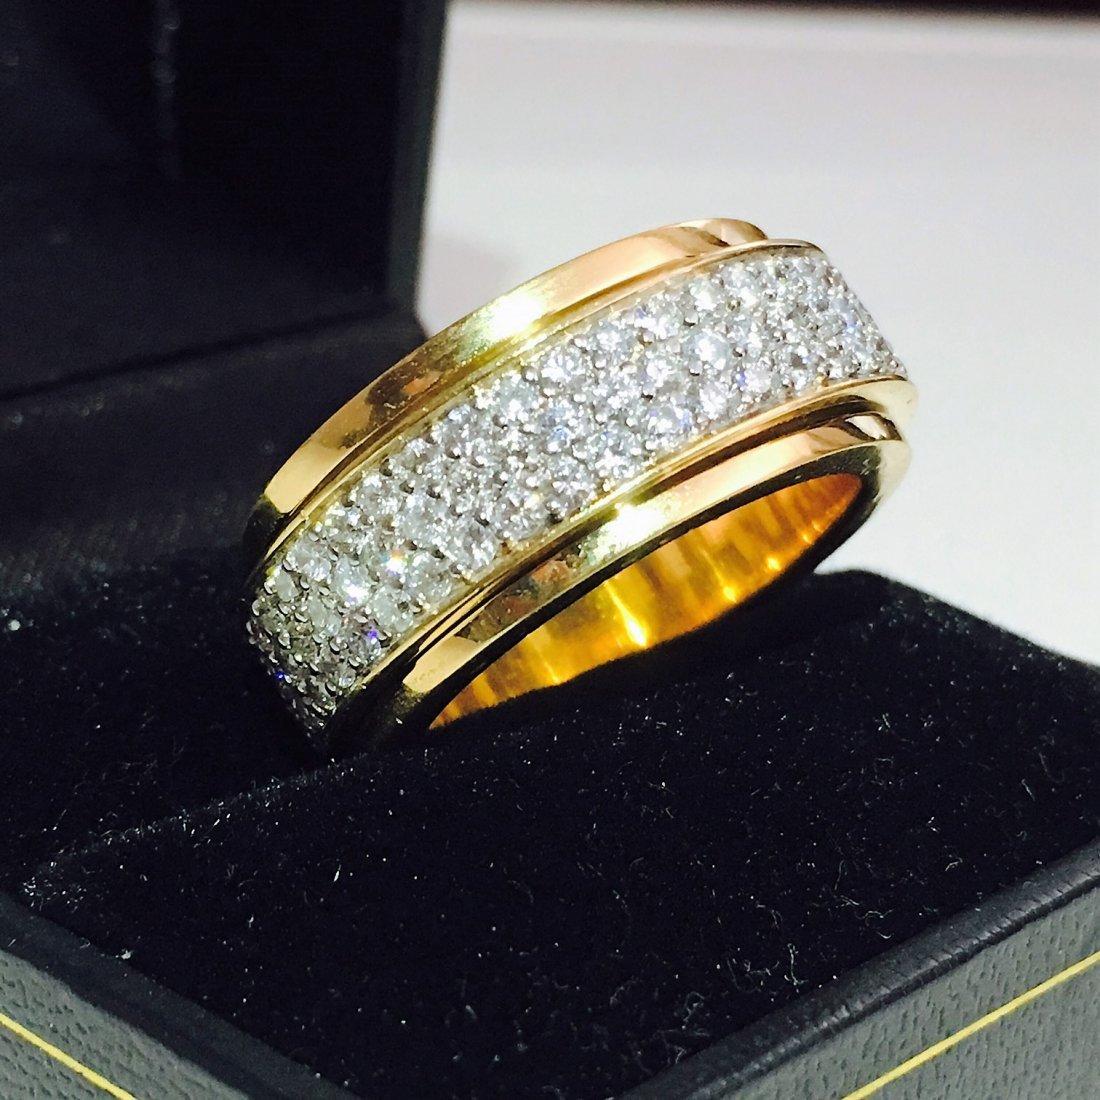 18k Yellow Gold, 4.50 Carat VVS Diamond Ring